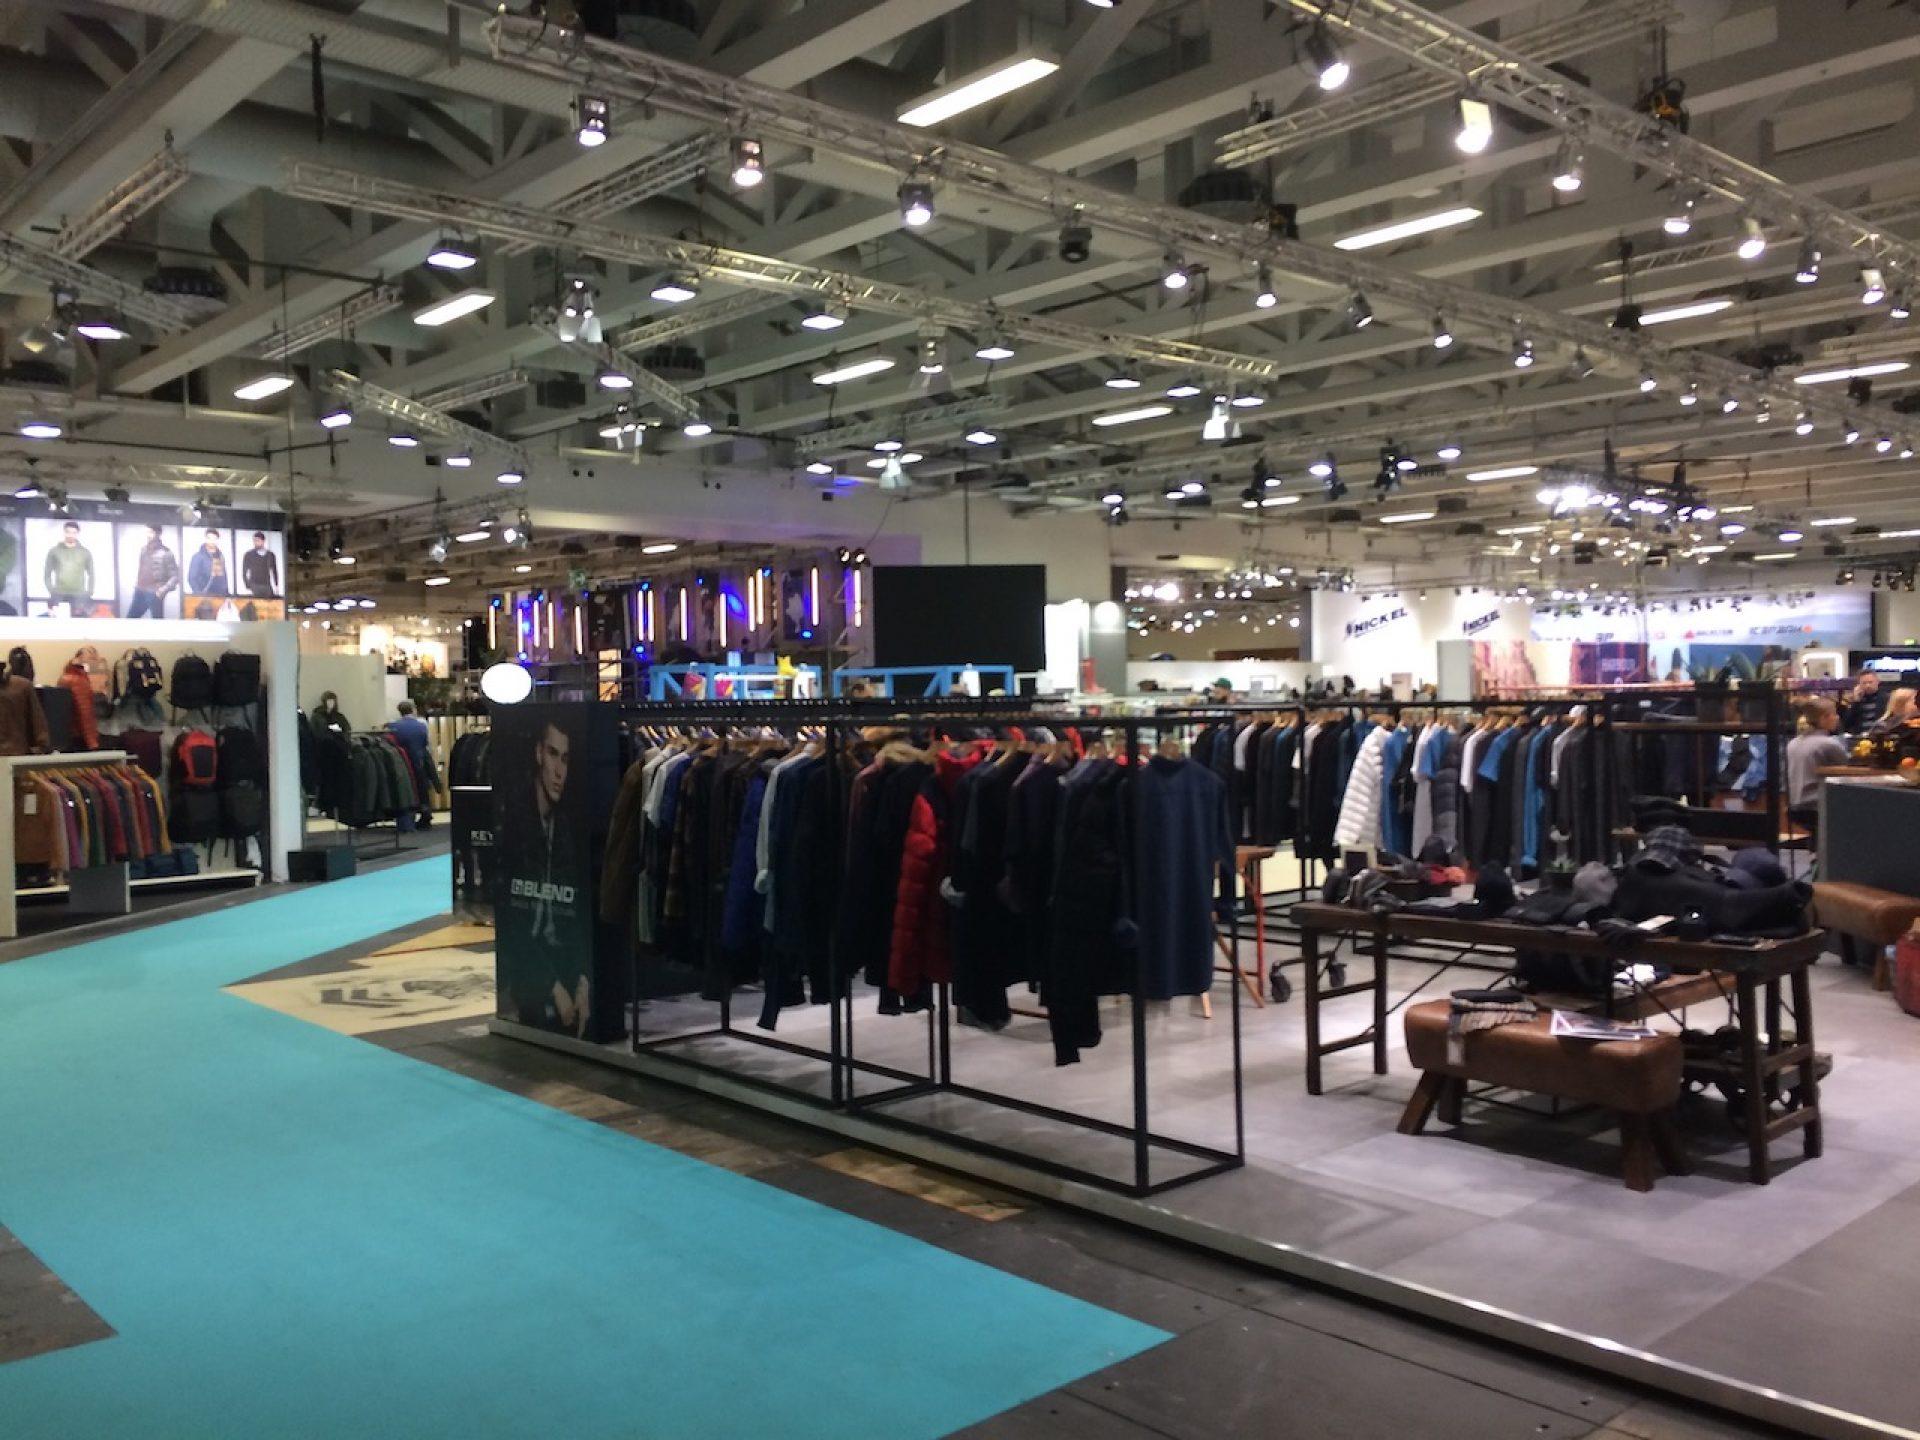 Panorama Trade Show Berlin Winter 2019 - Boardsport SOURCE